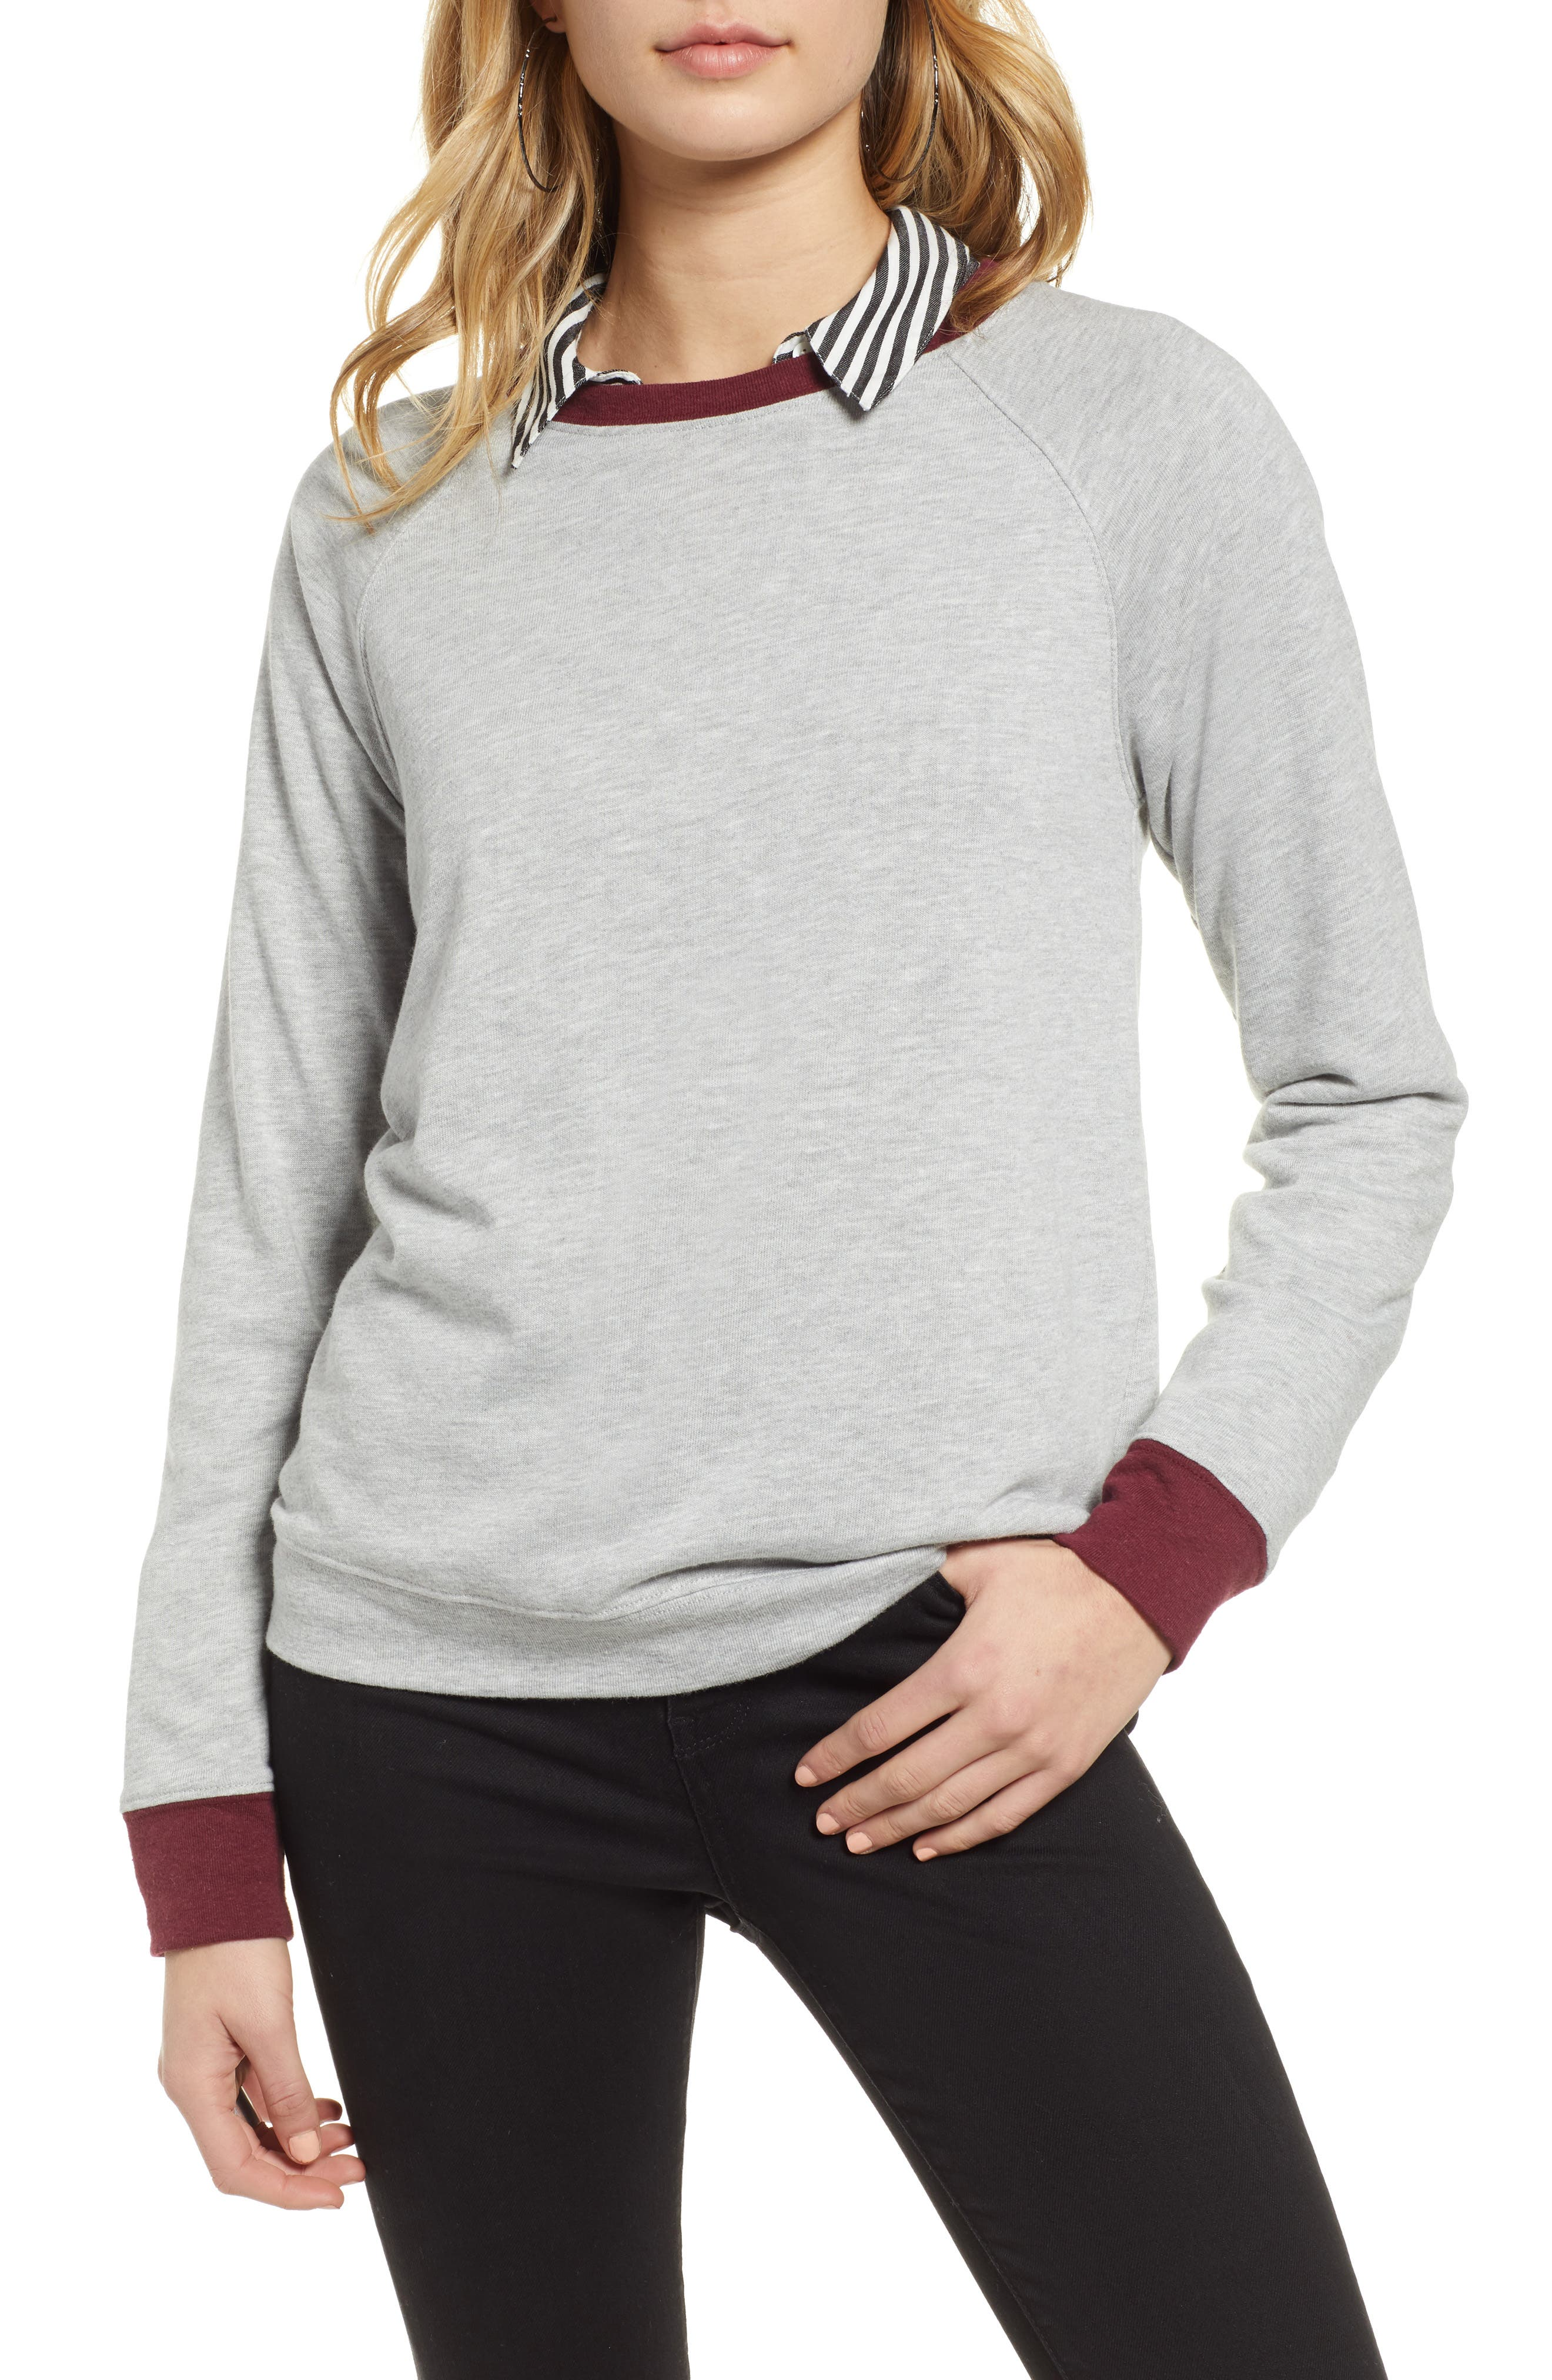 TREASURE & BOND Crewneck Sweatshirt, Main, color, GREY HEATHER- RED TANNIN COMBO